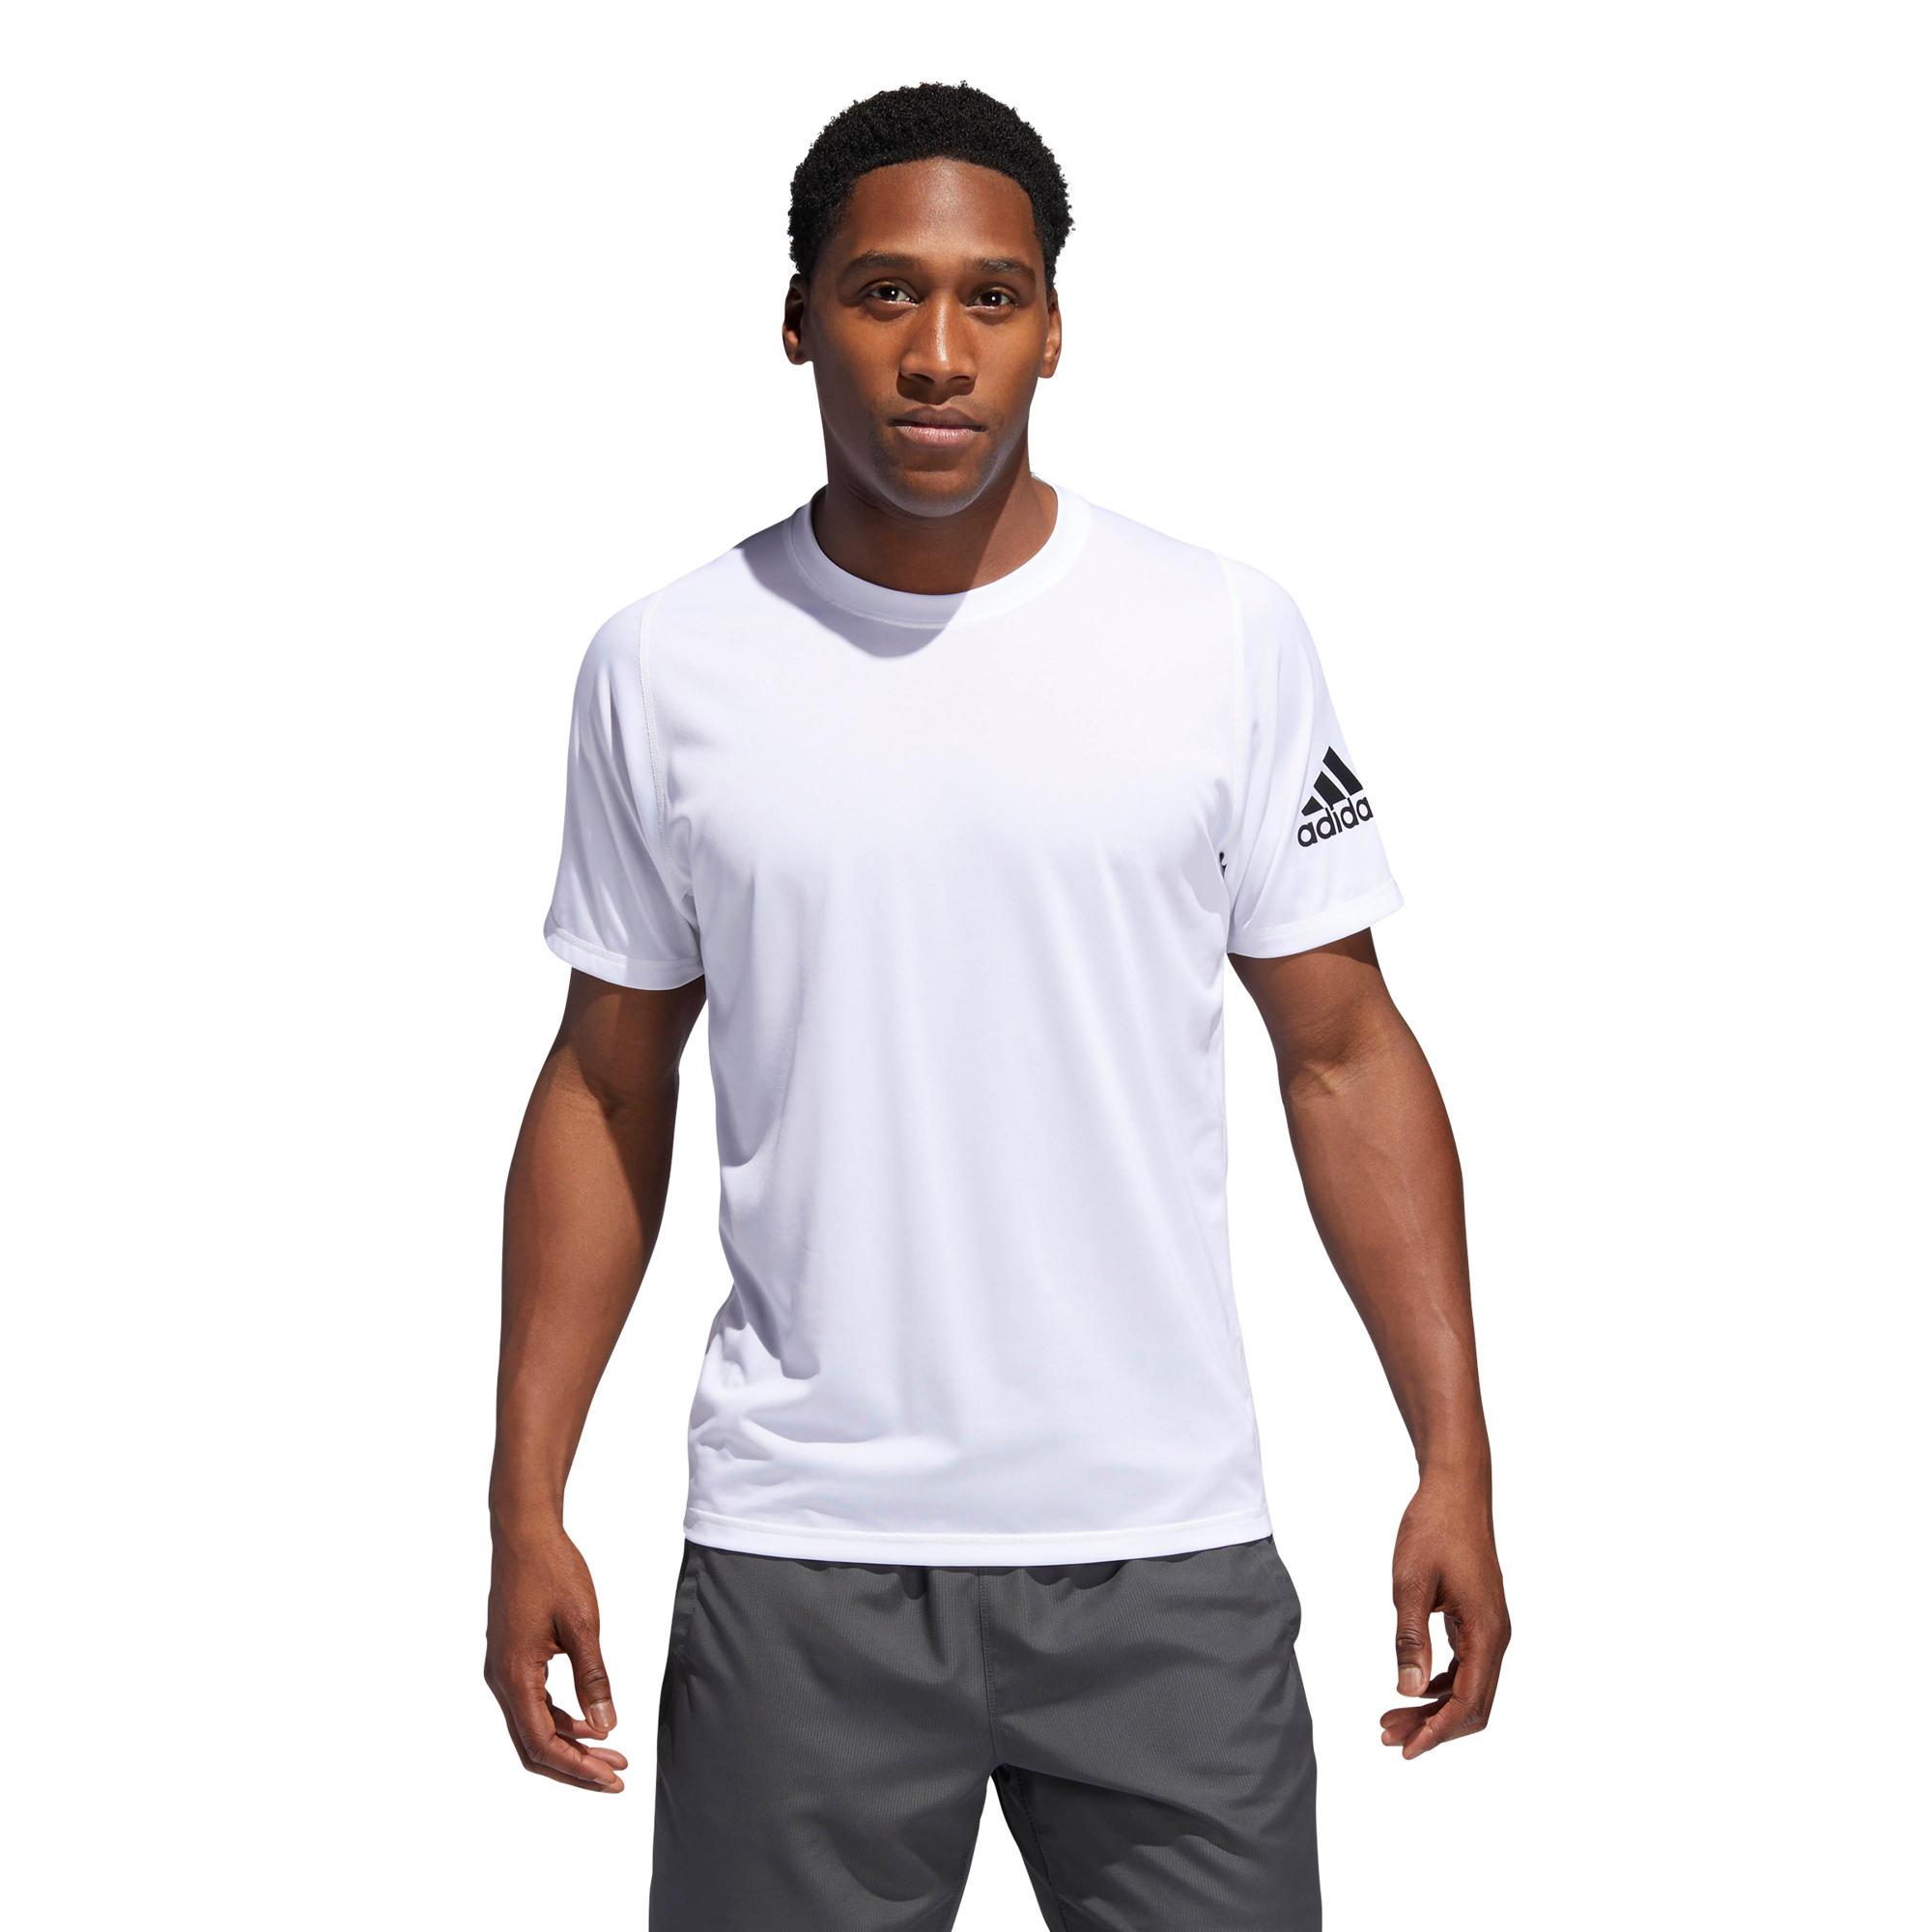 Siempre Comprimido aburrido  Adidas | Ropa | Zapatillas | en Decathlon camisetas em promoçãoroupa de  advogadacalça moletom masculina adidassapatilhas decathlon